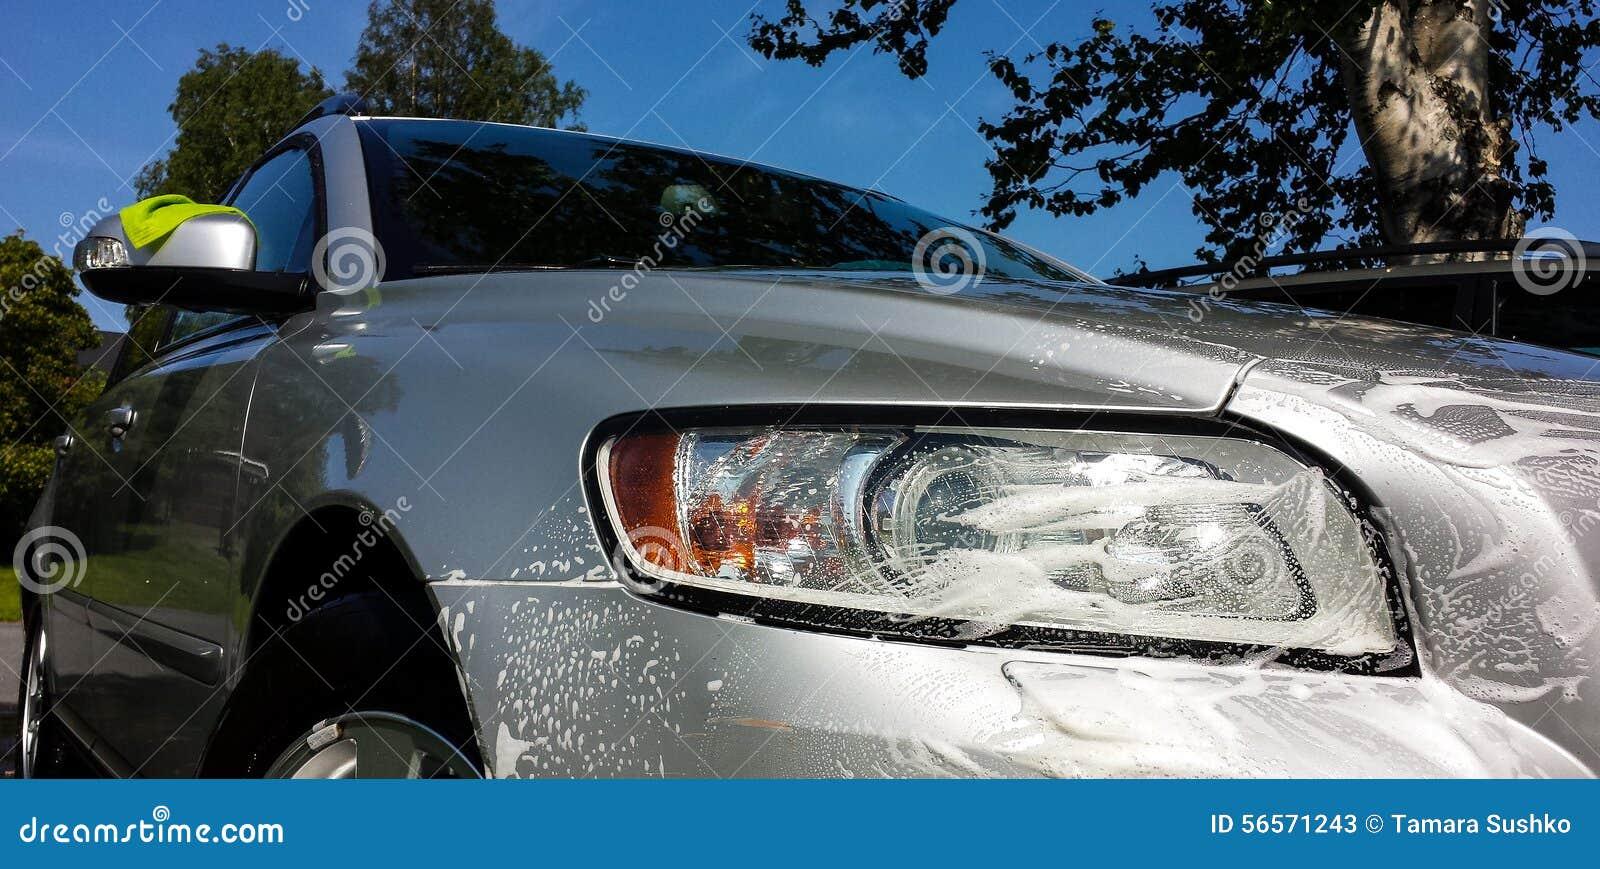 Download Βάψιμο παραθύρων αυτοκινήτων Στοκ Εικόνα - εικόνα από εύθυμος, καθαρίστε: 56571243